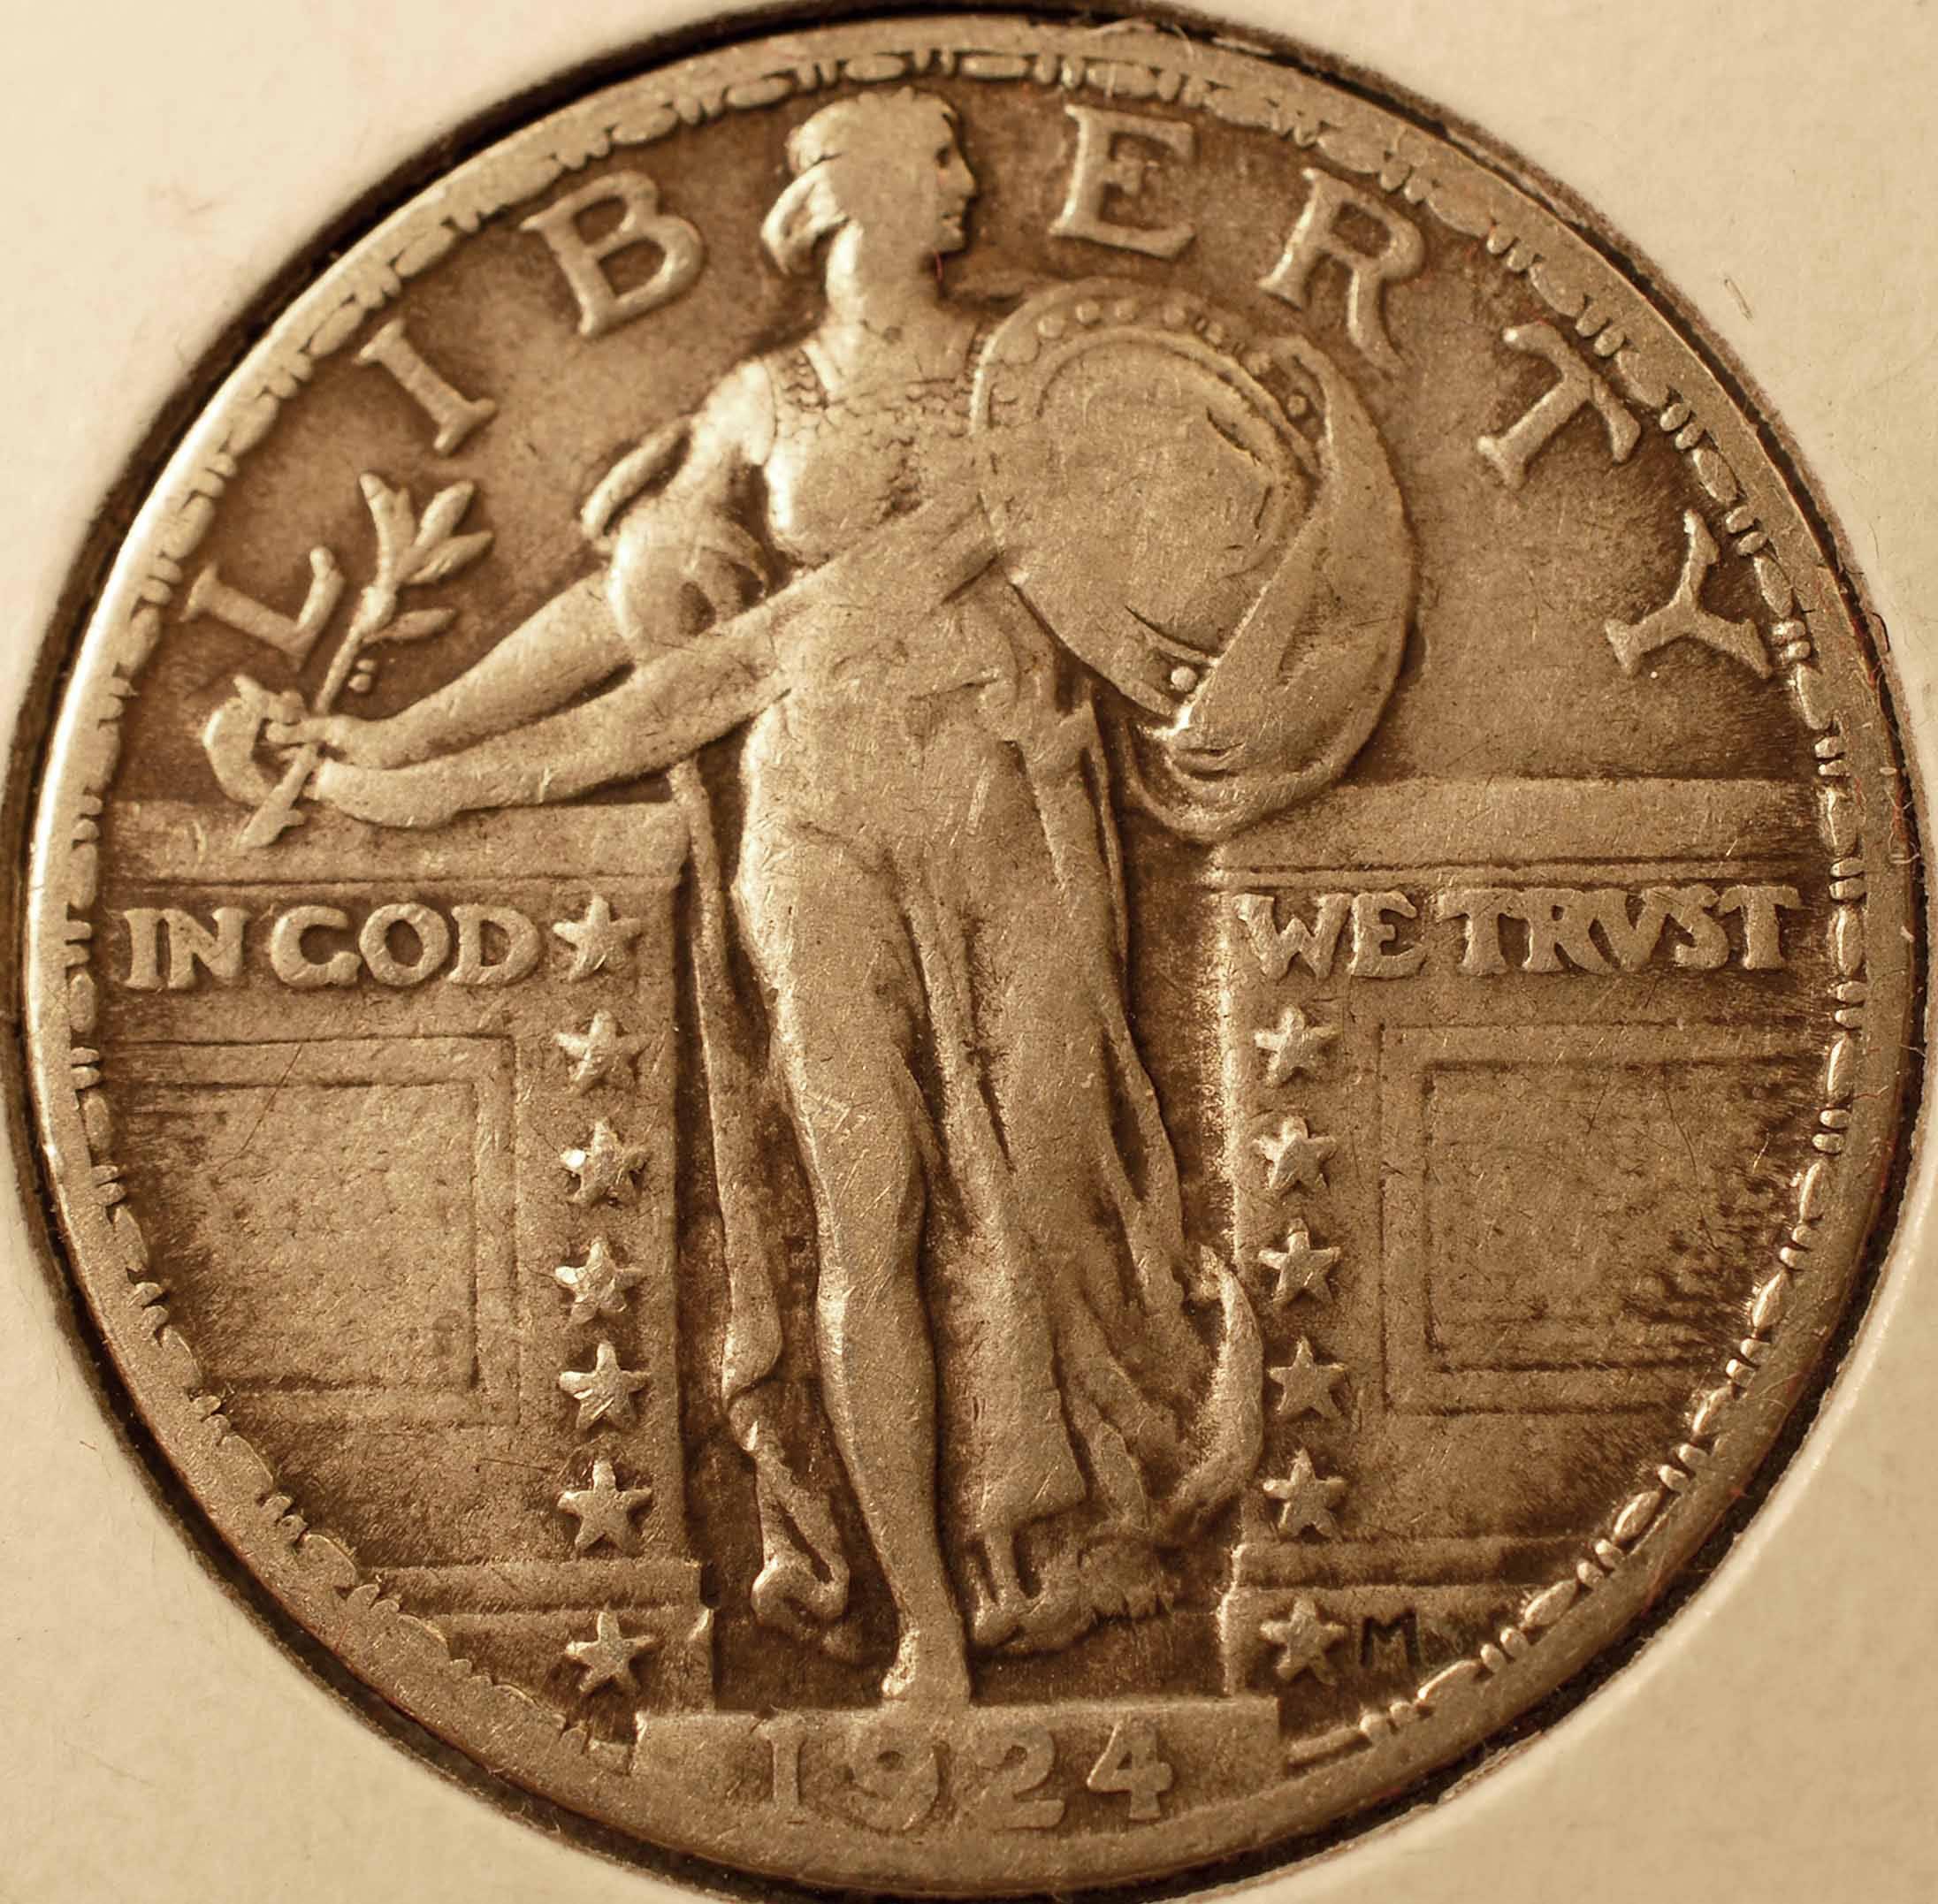 1924 Standing Liberty Quarter Obverse